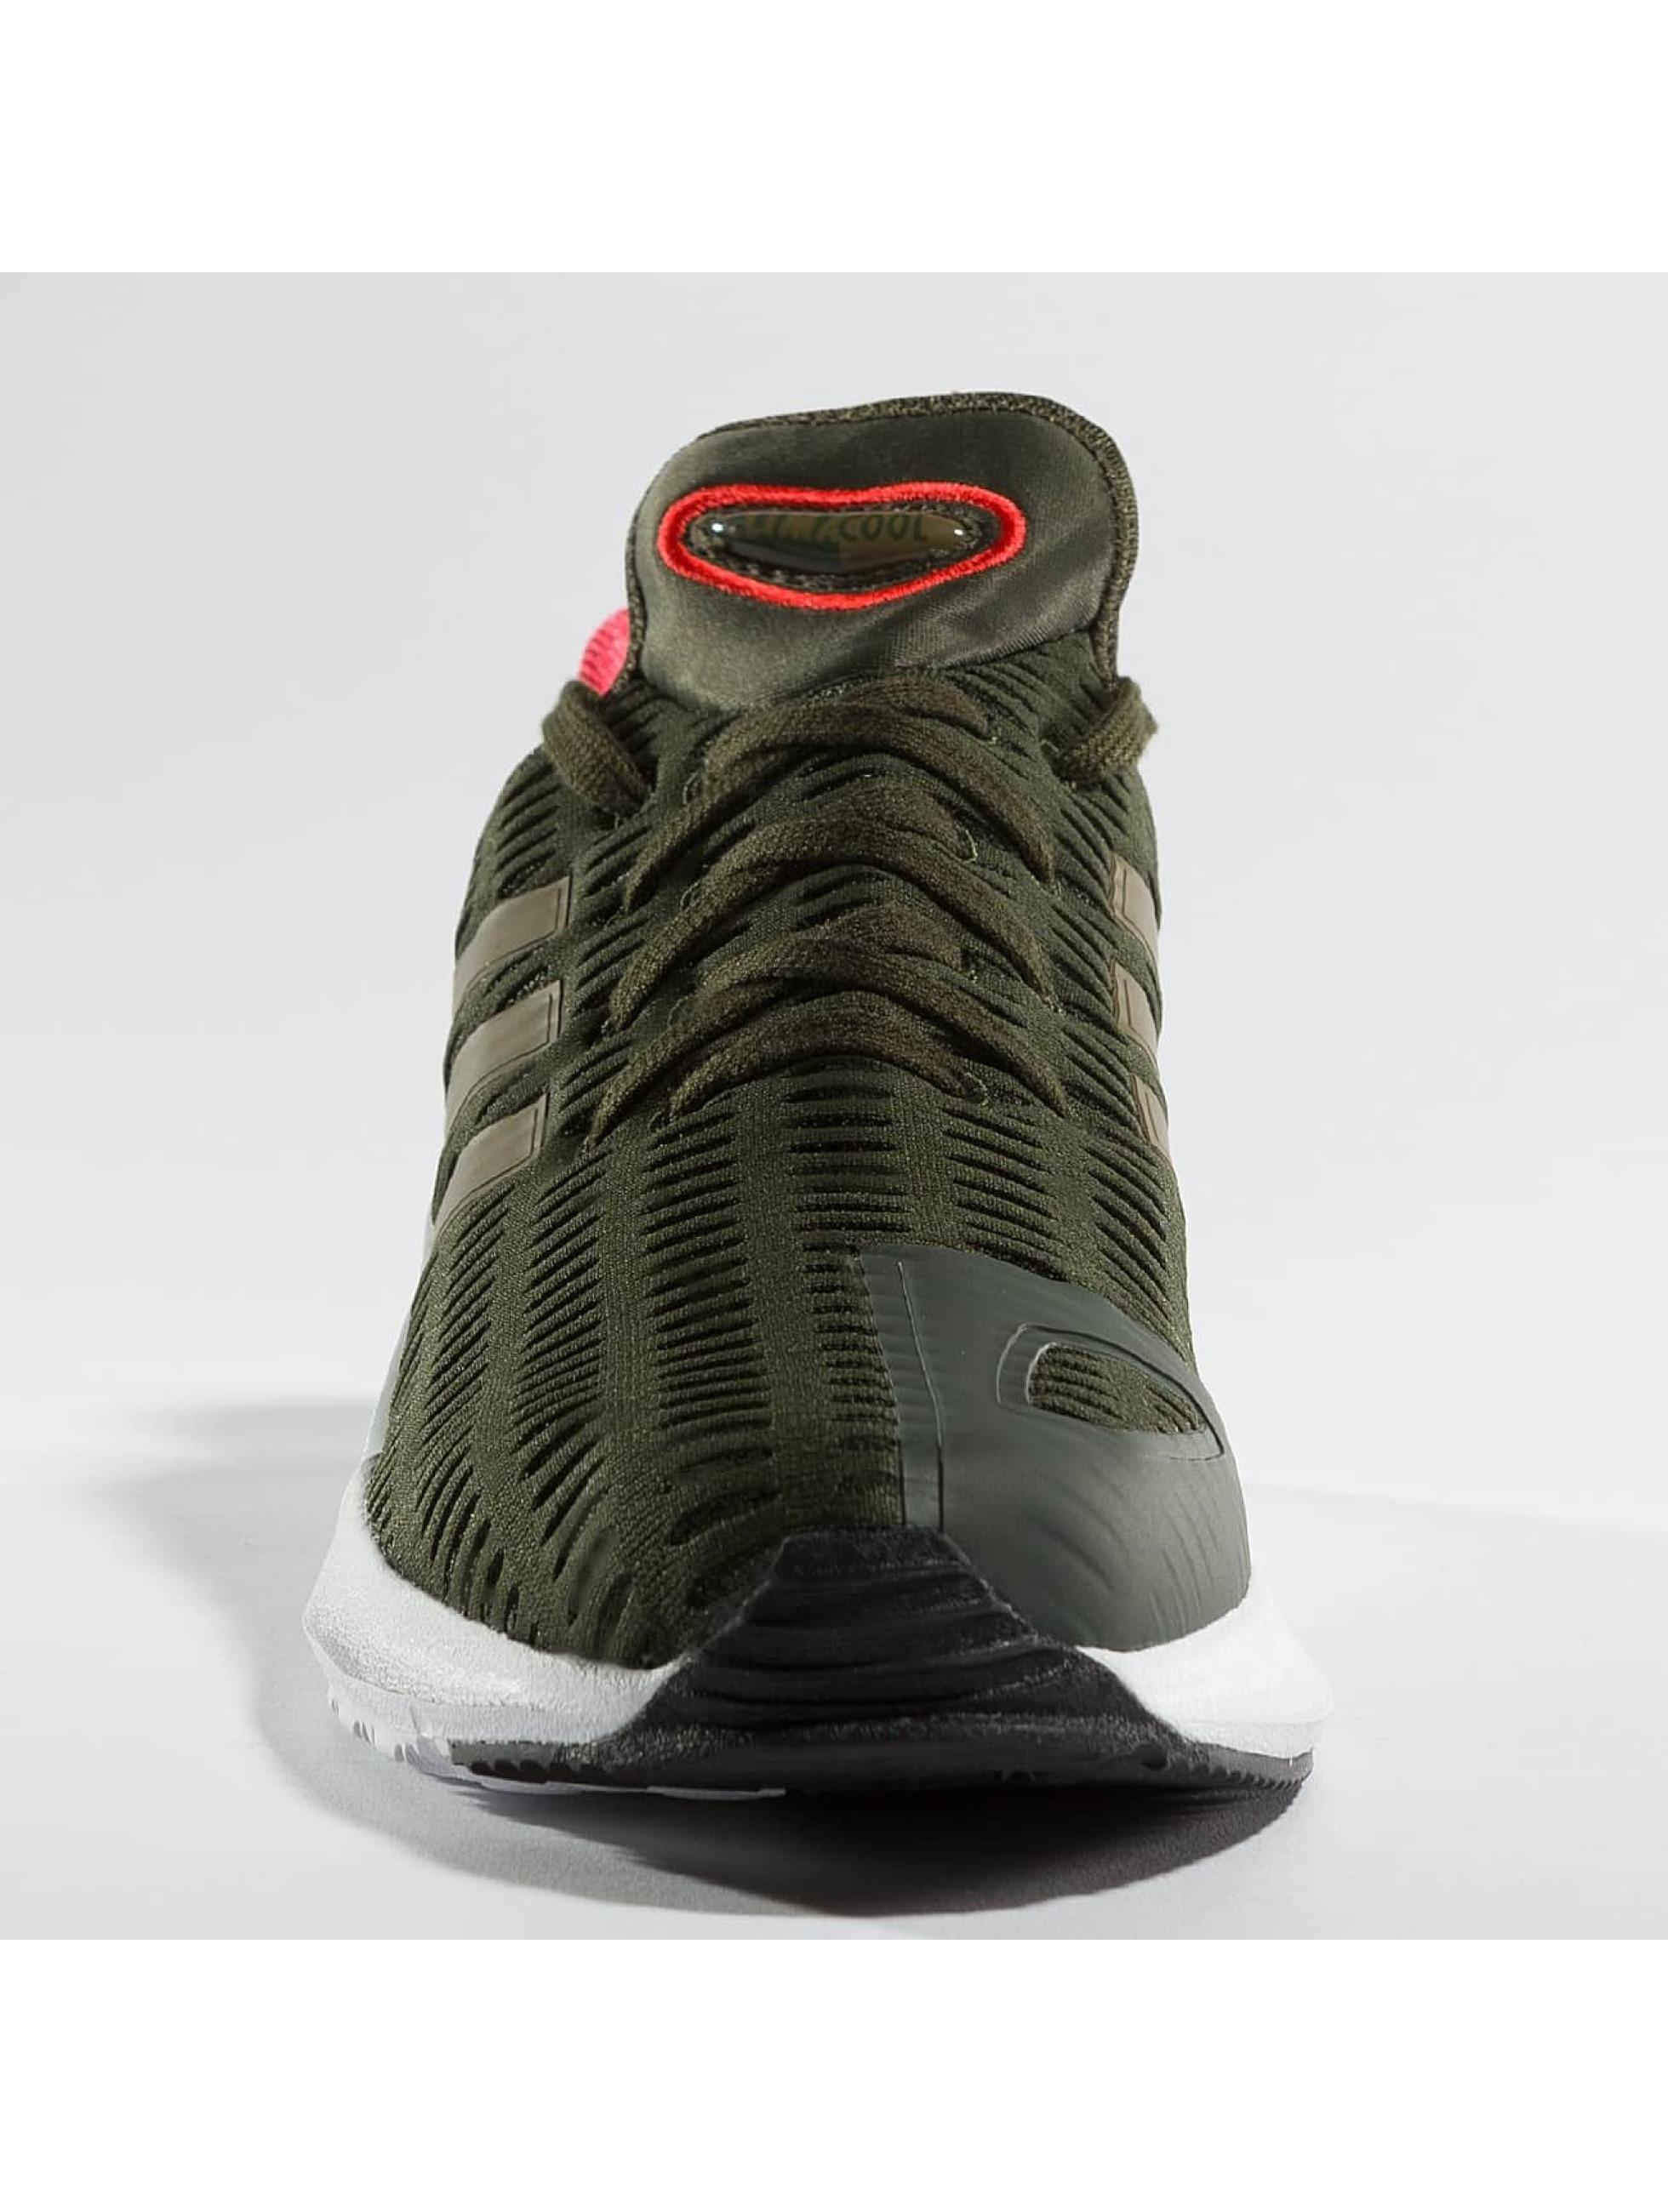 adidas originals Sneakers Climacool 02/17 green